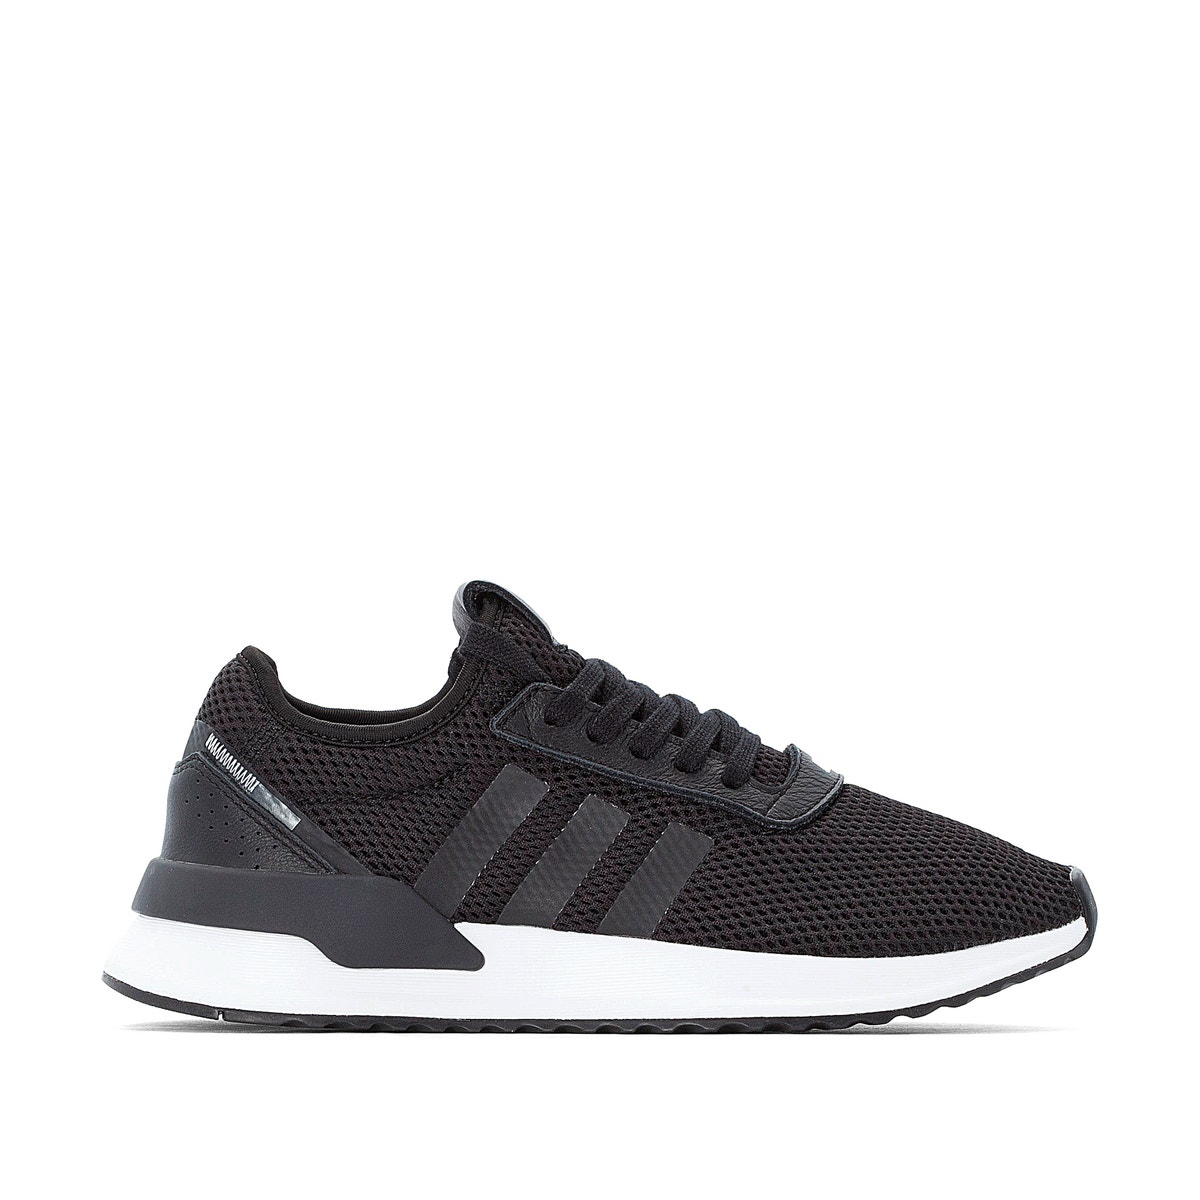 adidas Originals - Αθλητικά παπούτσια, U Path Run 350153105 - 6527